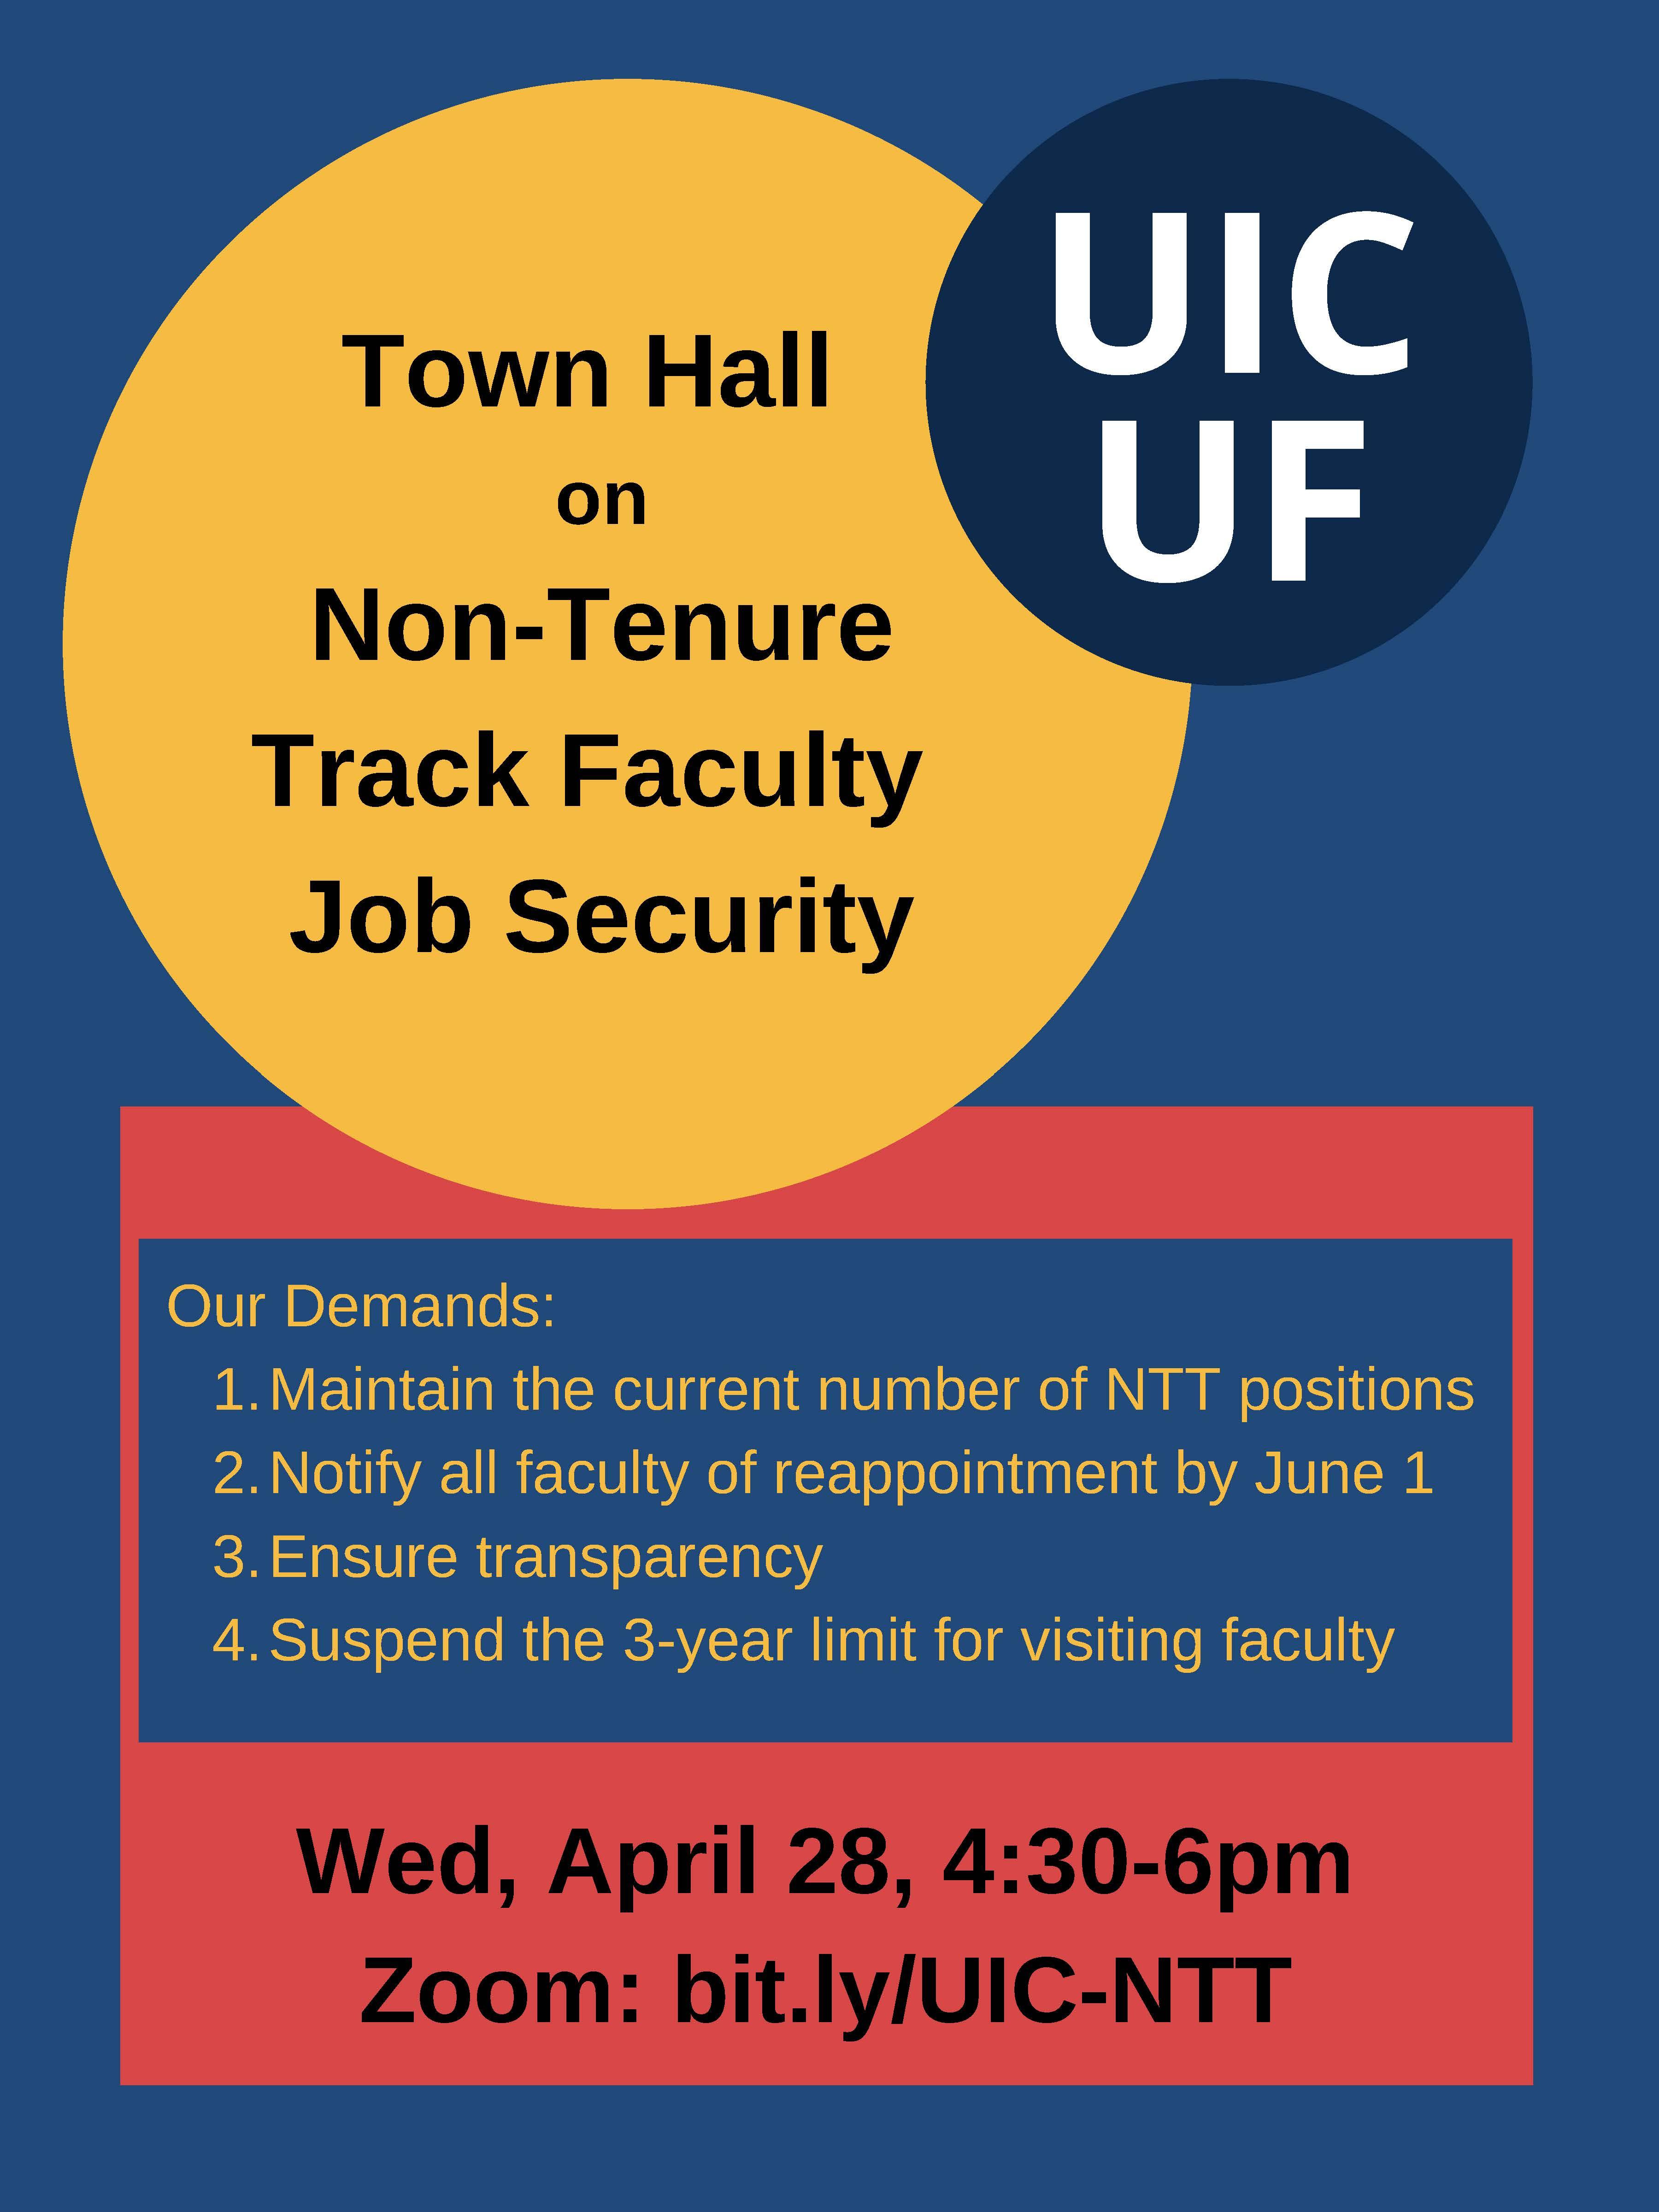 Uic Spring 2022 Calendar.Uic United Faculty News